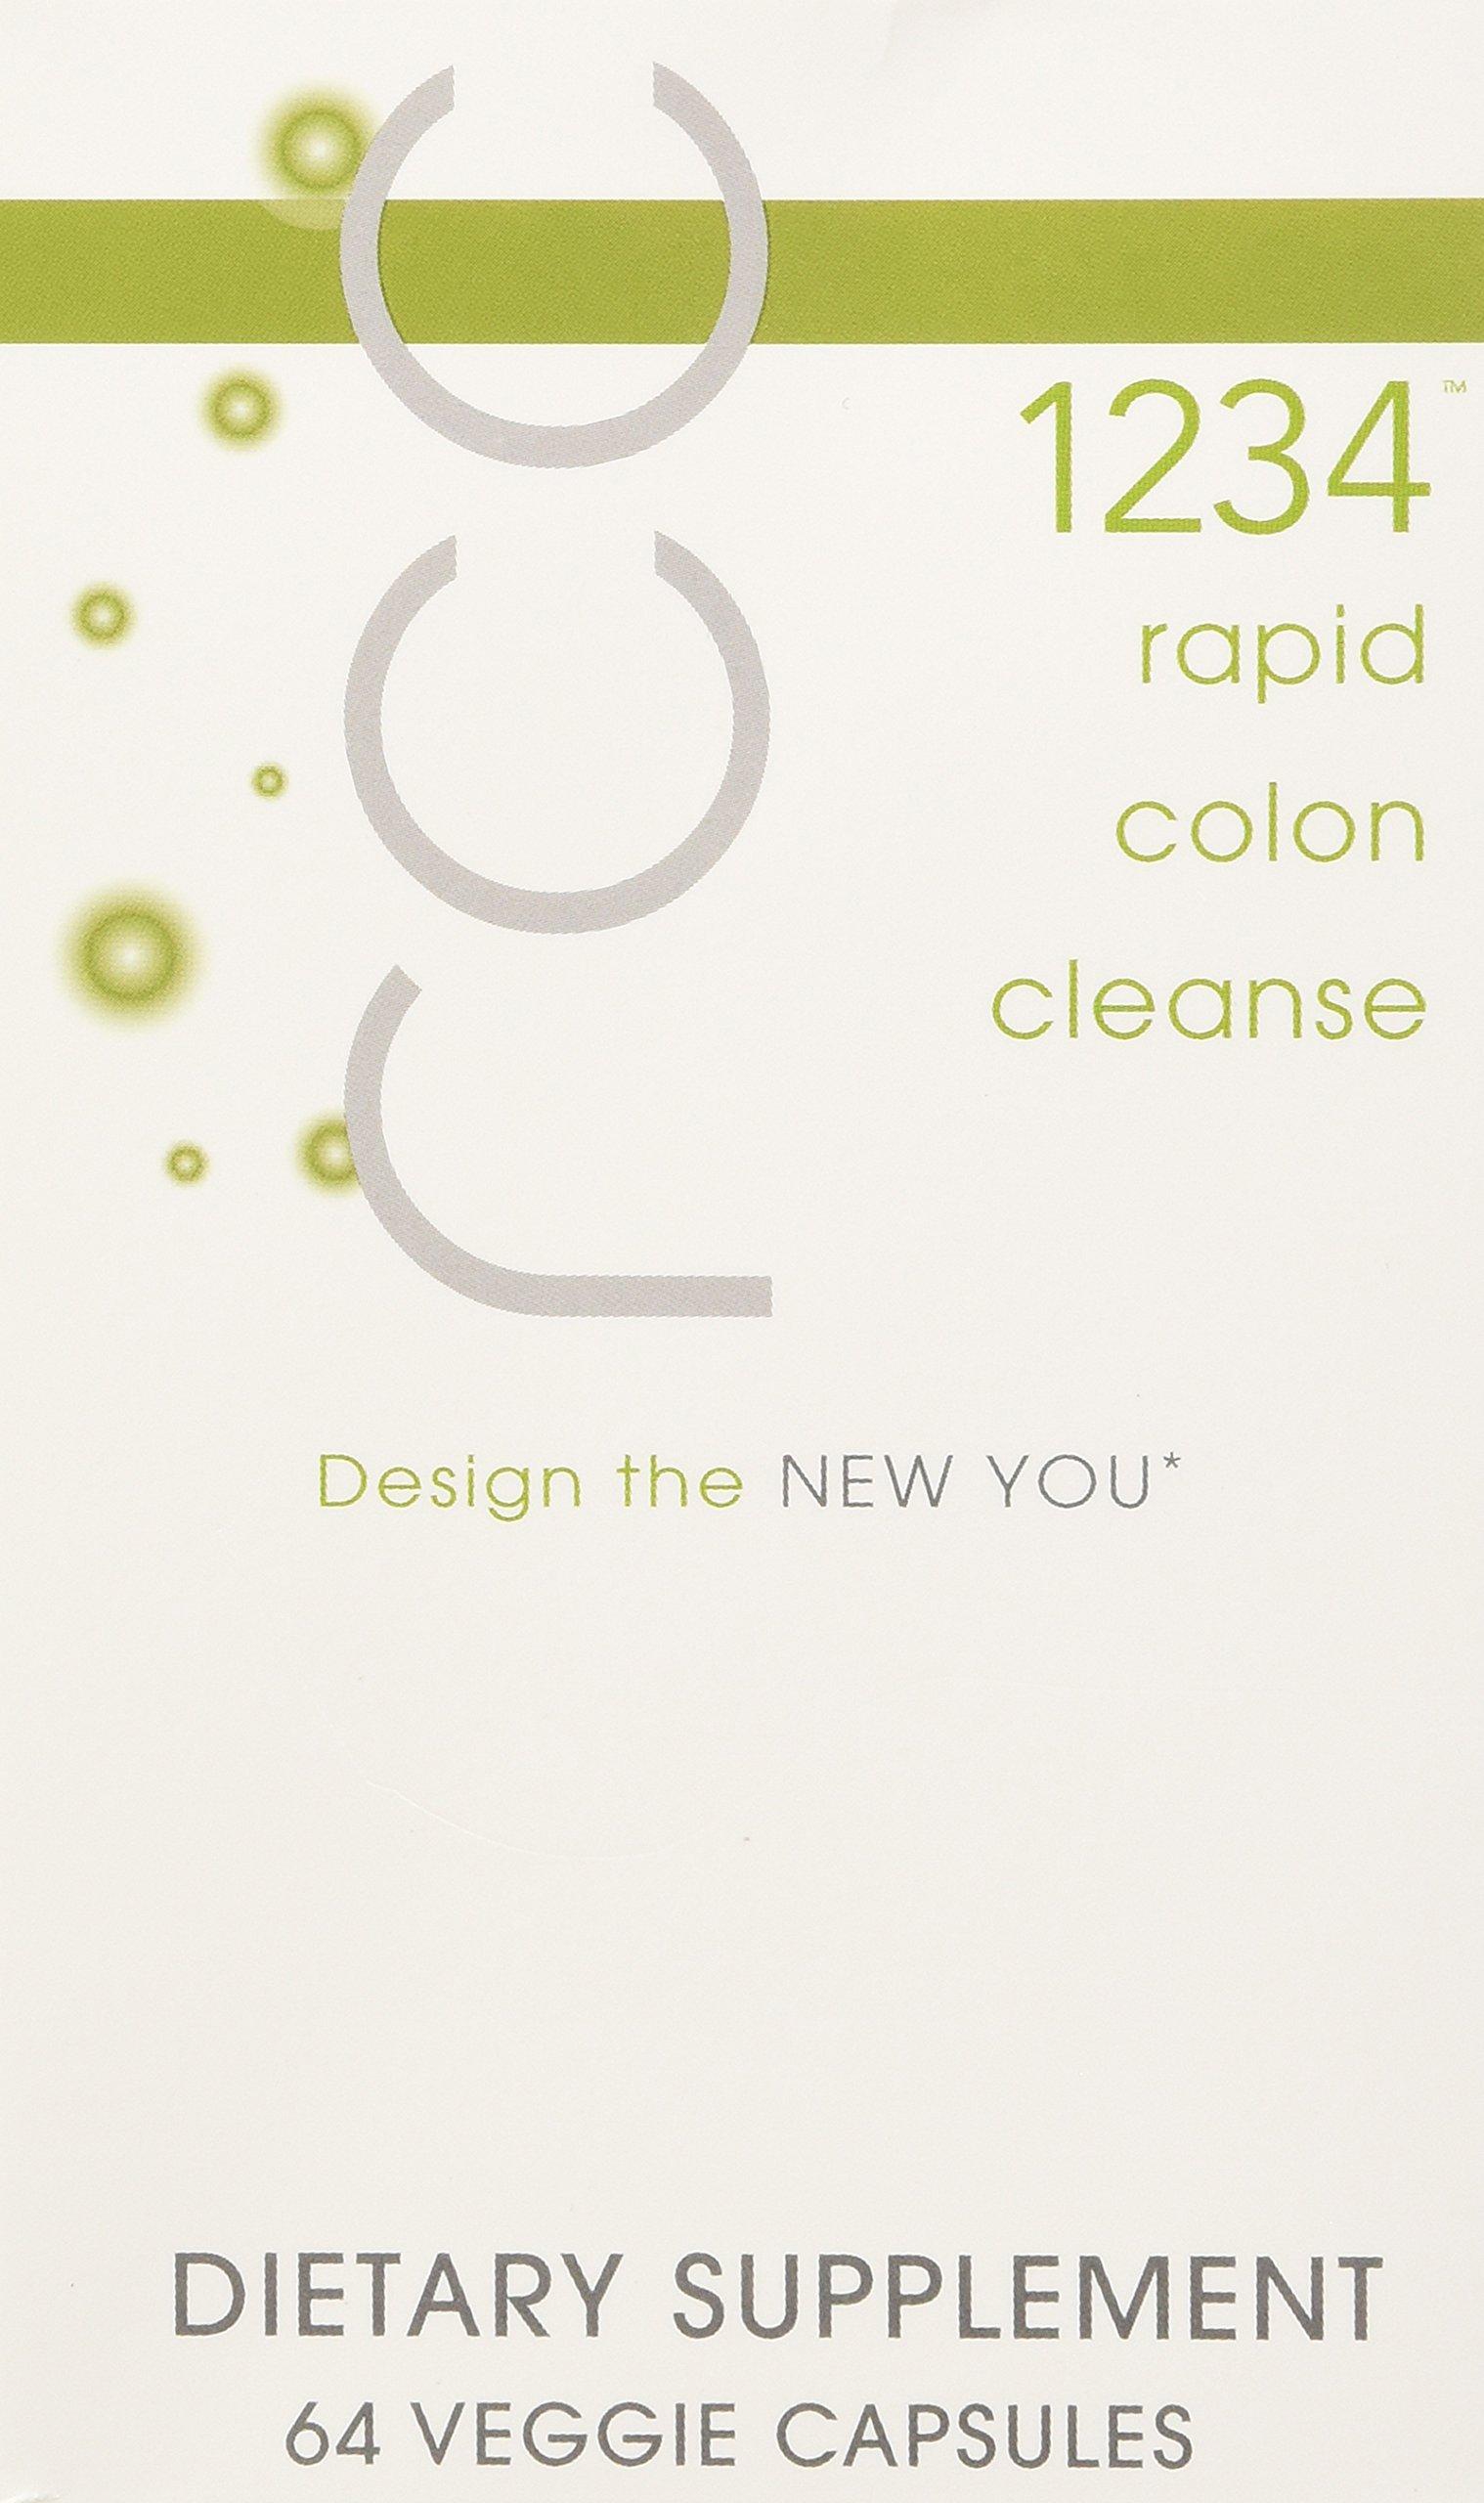 Creative Bioscience Rcc1234 - Rapid Colon Cleanse, 64 Count